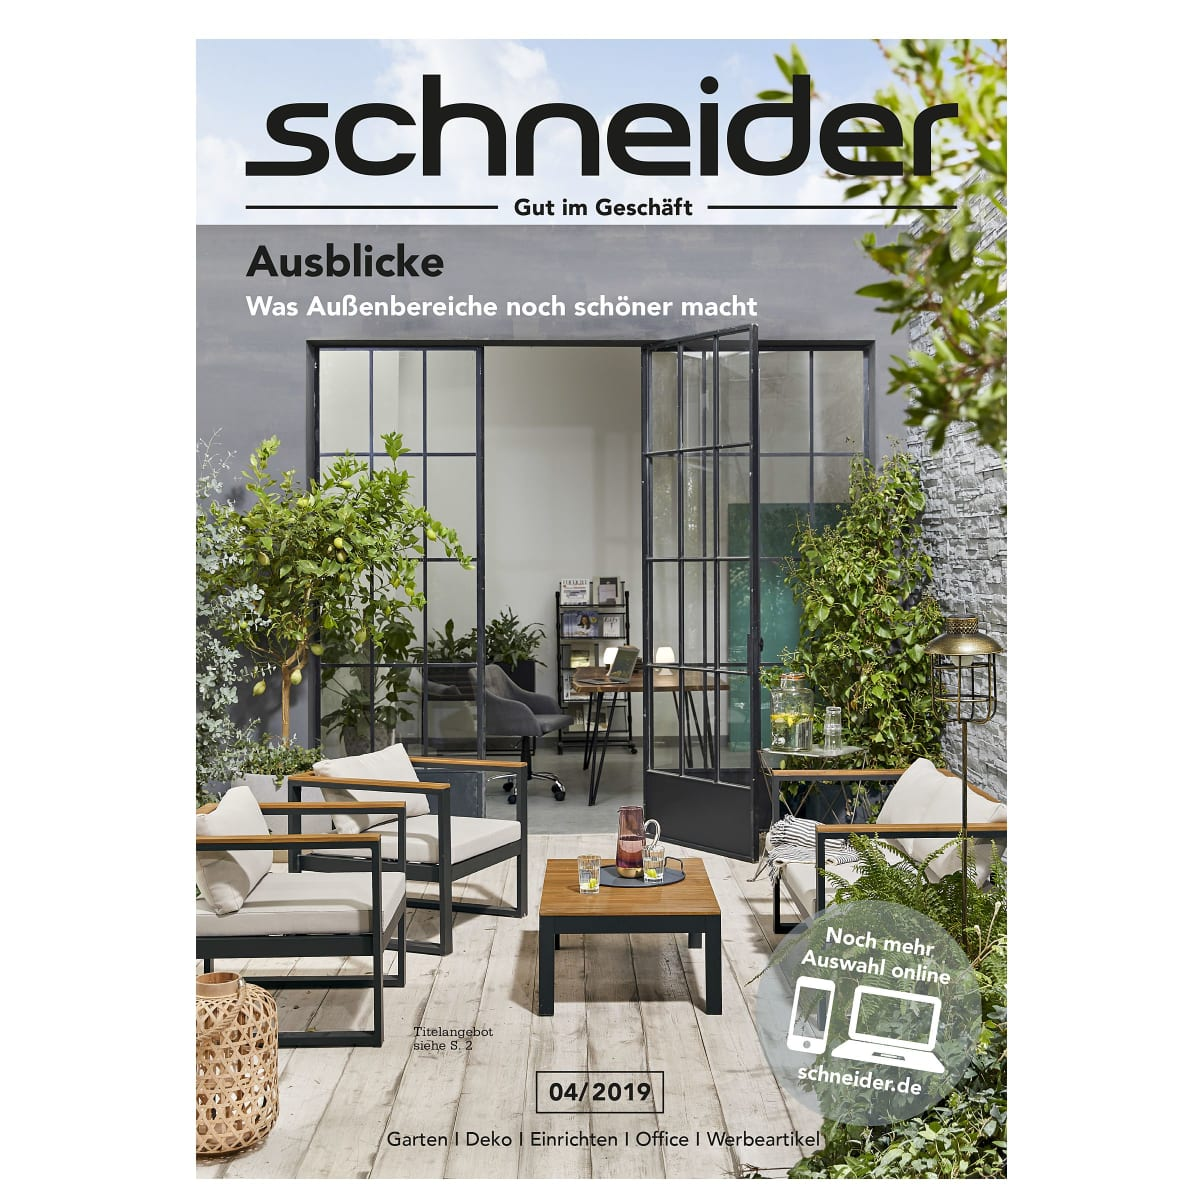 katalog bestellen im online shop schneider de. Black Bedroom Furniture Sets. Home Design Ideas